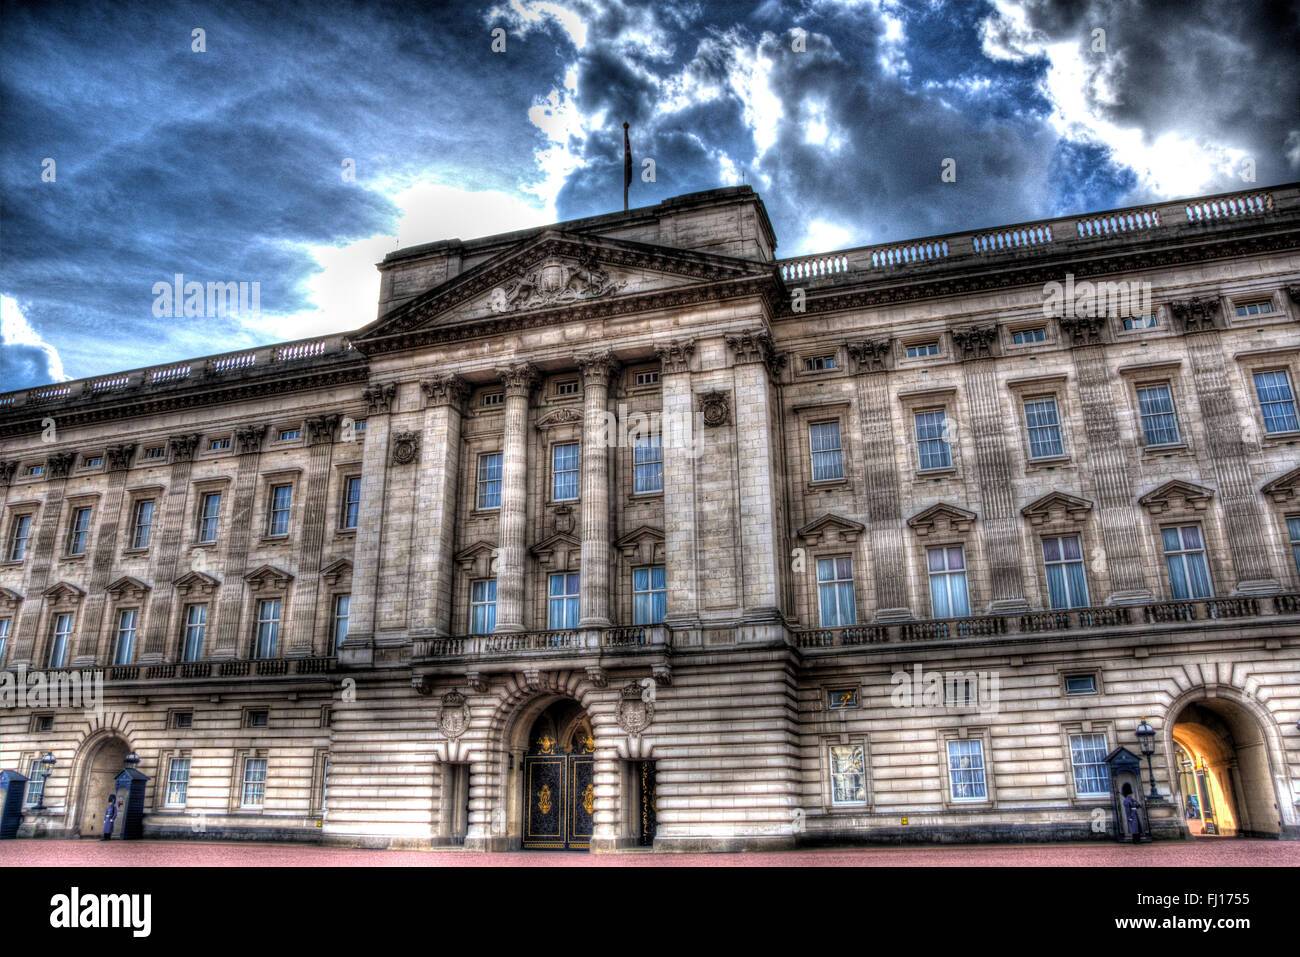 Buckingham Palace shot in High Dynamic Range (HDR) - Stock Image